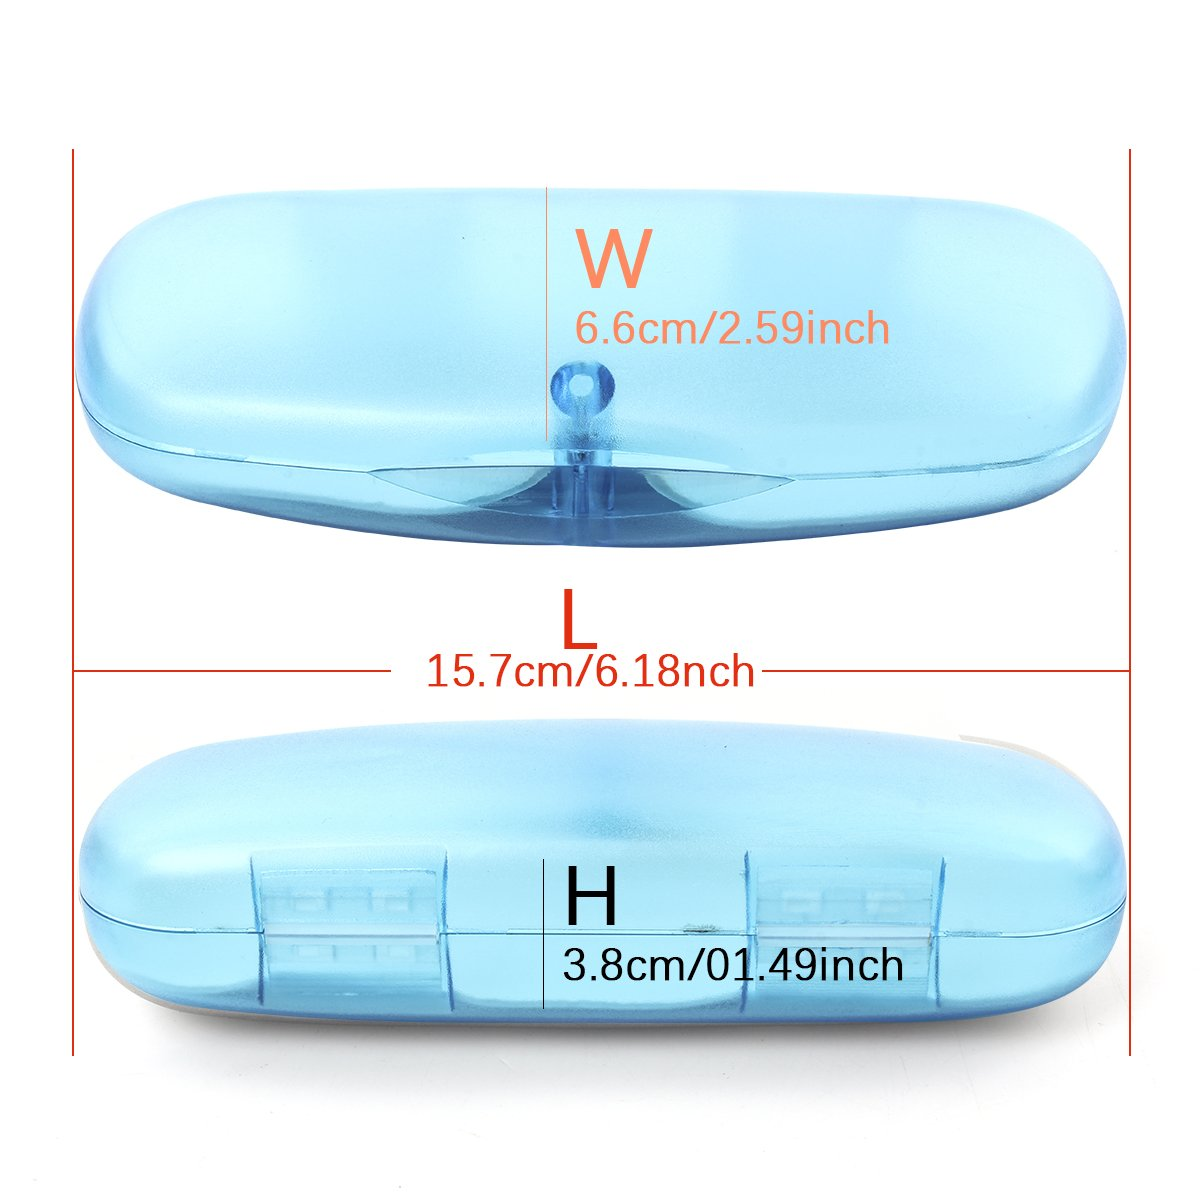 EZESO Glasses Case Spectacle Case Box Magnetic Closure Plastic Translucent Eyeglass Case